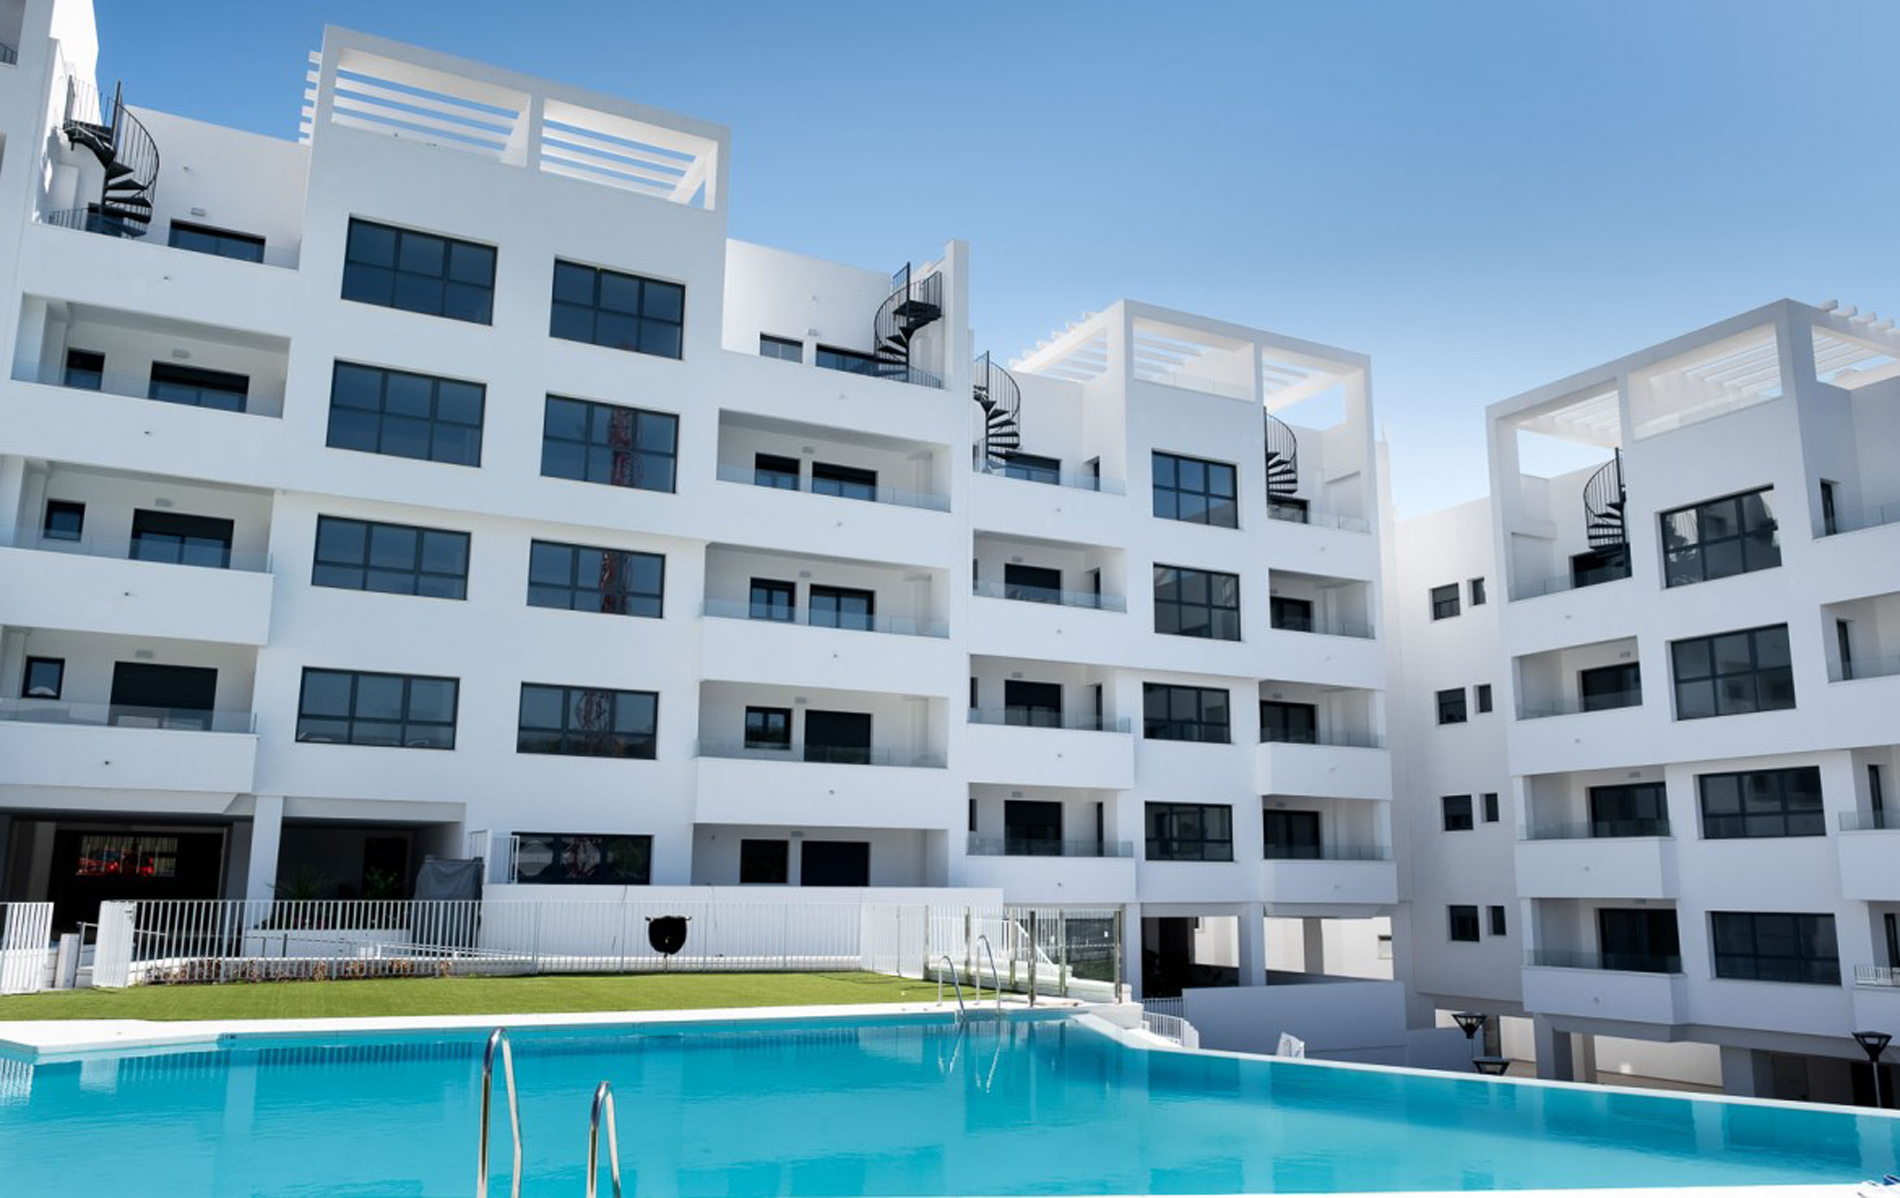 Appartements en vente à Estepona MCO9062093